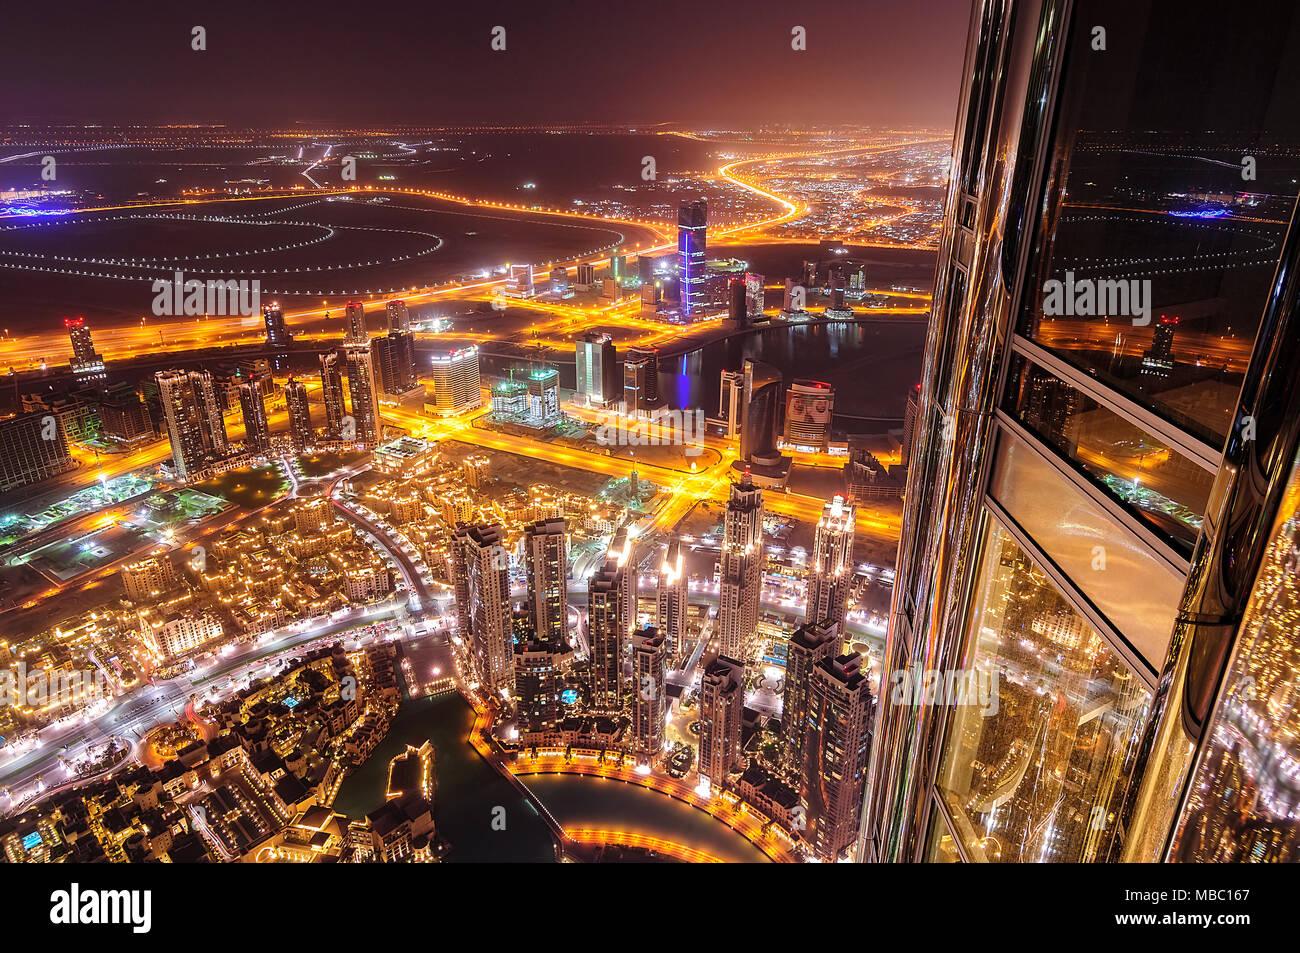 DUBAI, UAE - APR 14, 2013: Dubai downtown aerial view by night from highest skyscraper of the world Burj Khalifa, Dubai, United Arab Emirates - Stock Image